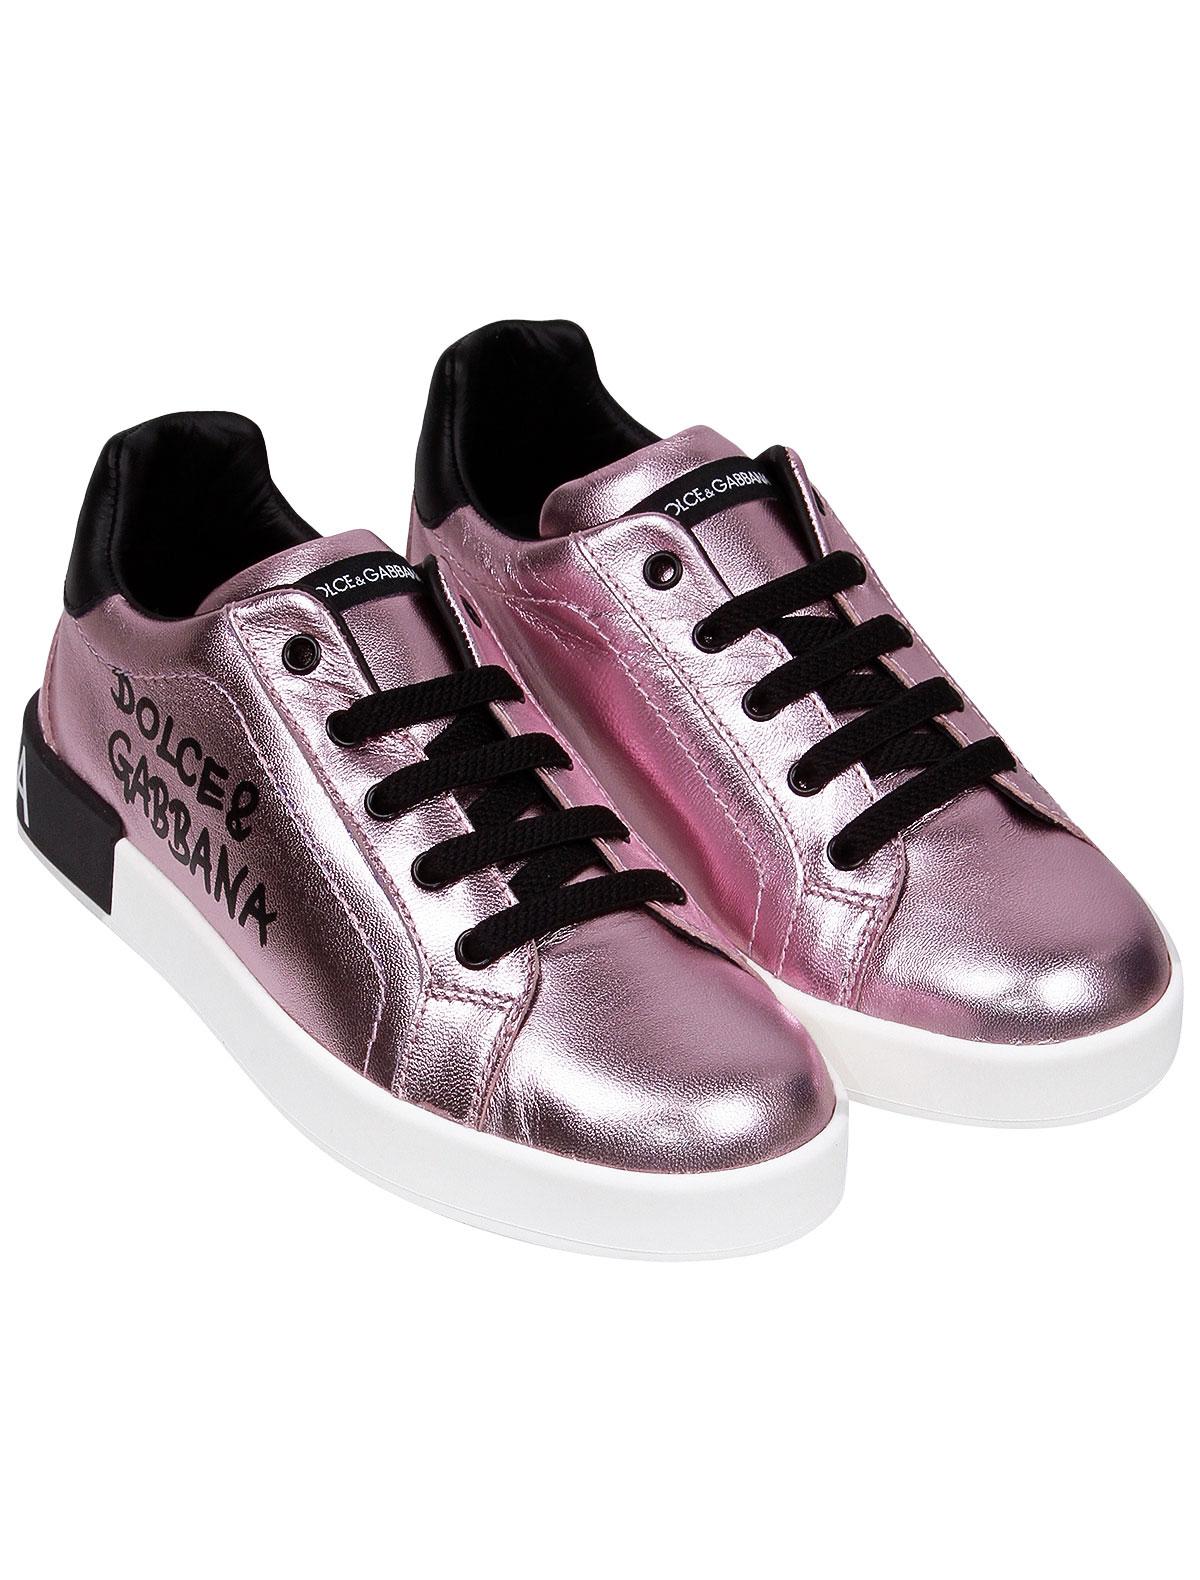 Кеды Dolce & Gabbana розового цвета